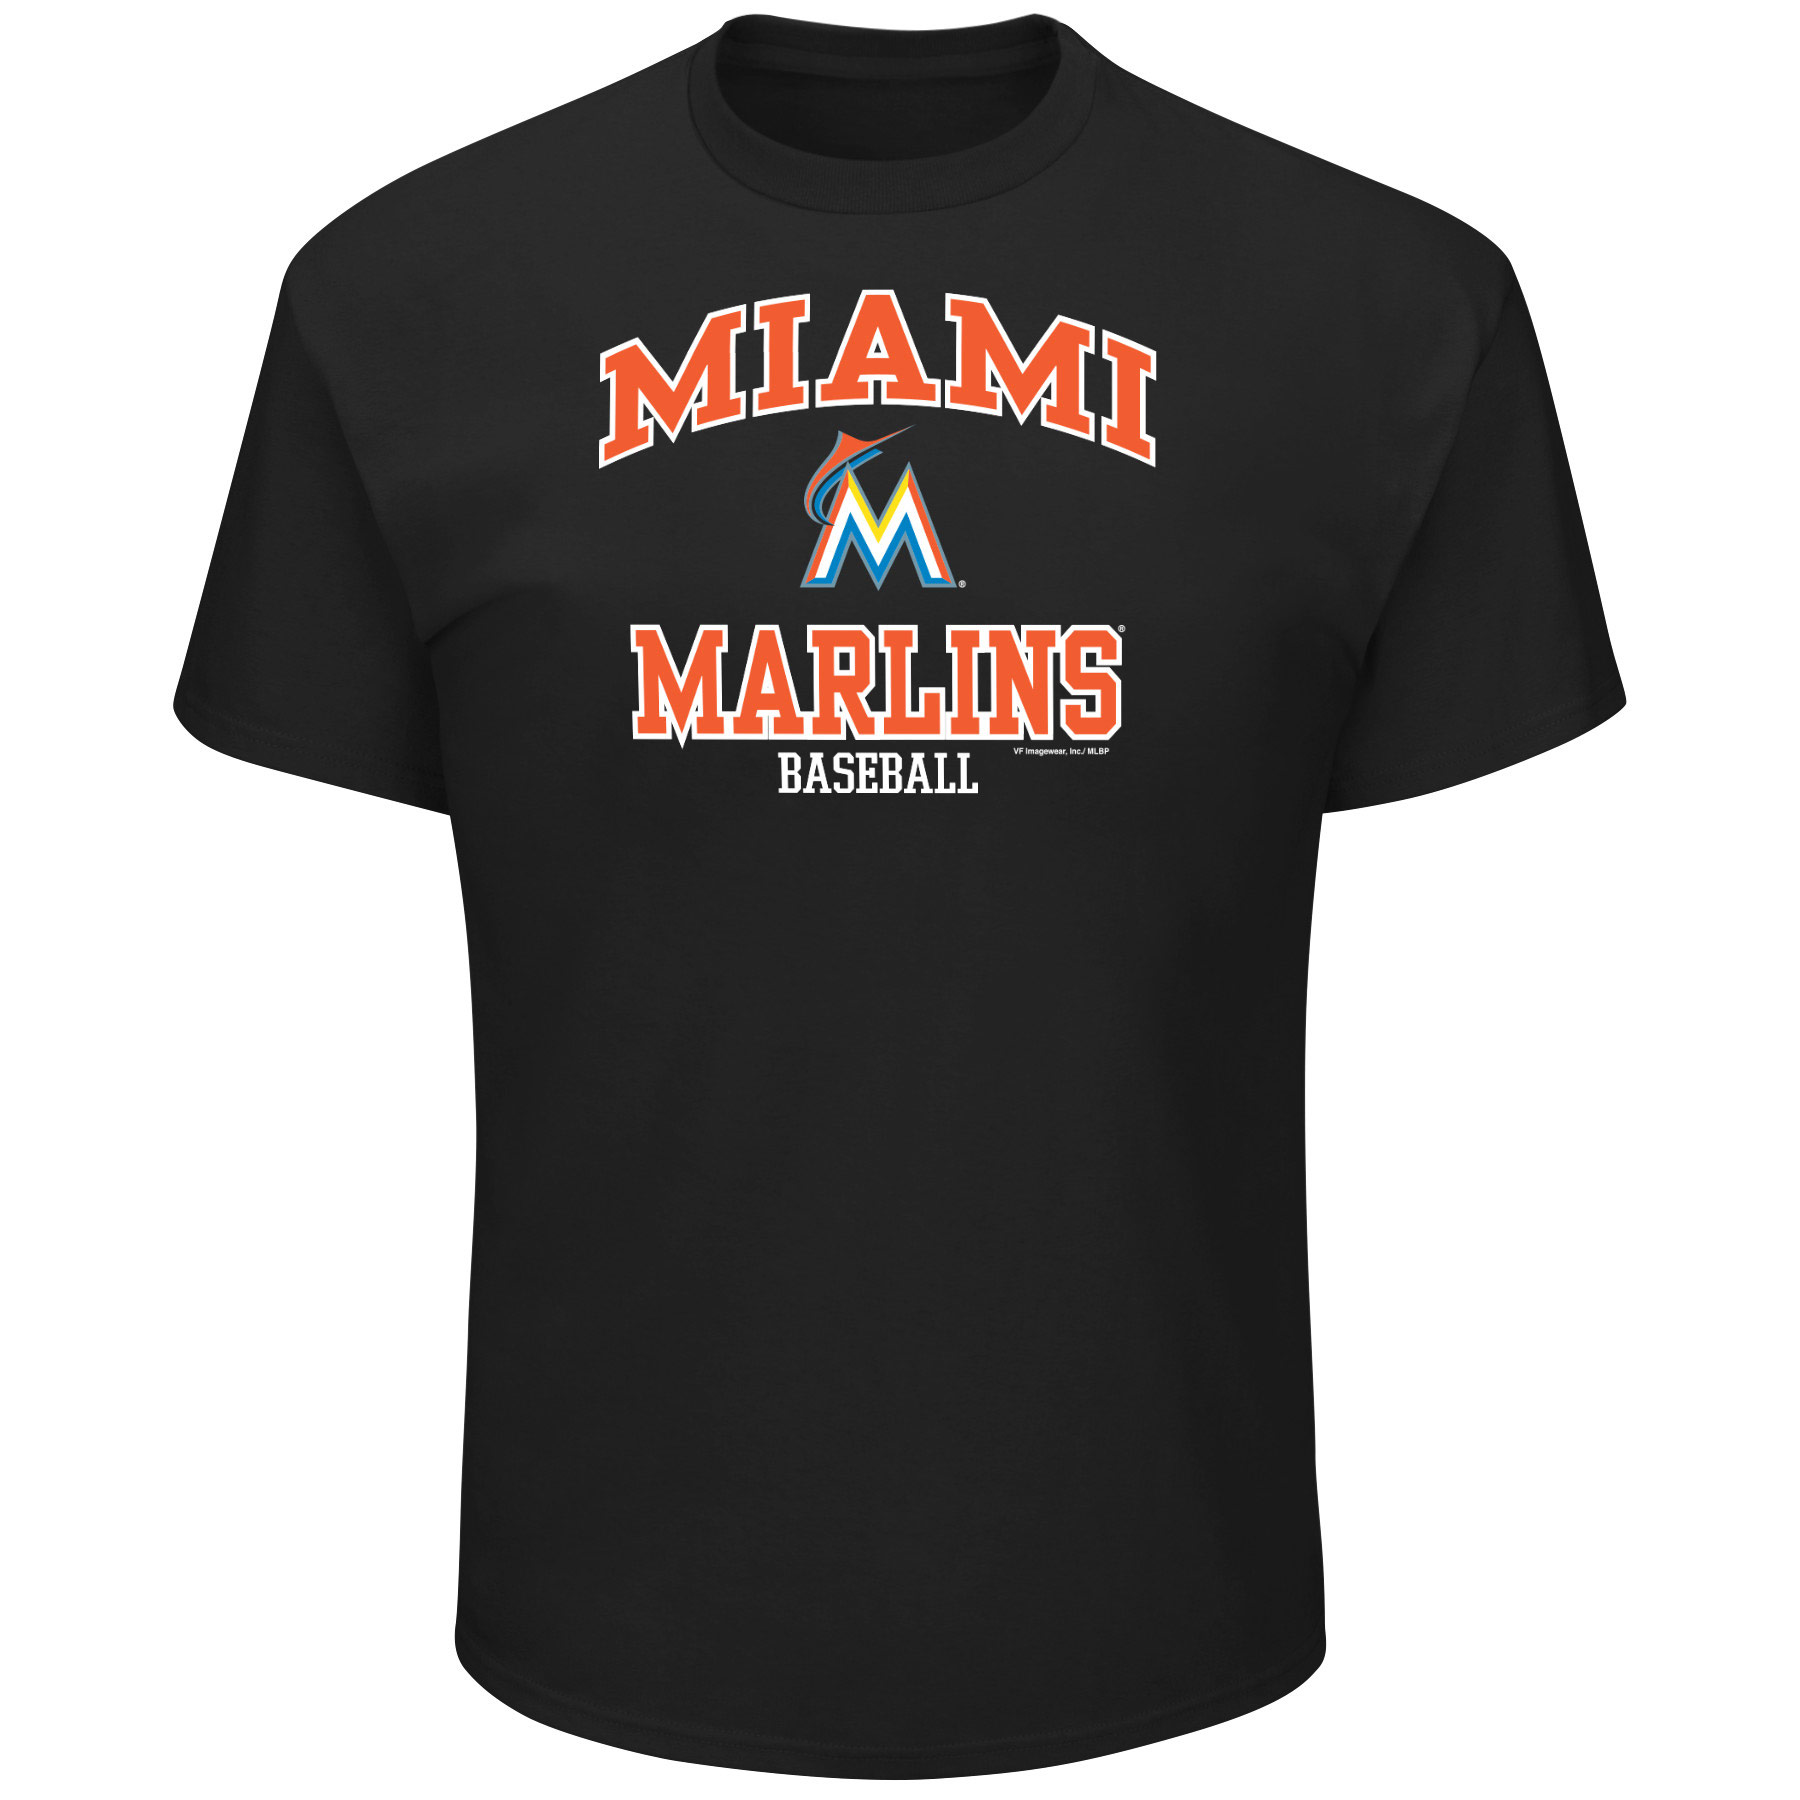 Men's Majestic Black Miami Marlins High Praise Team T-Shirt